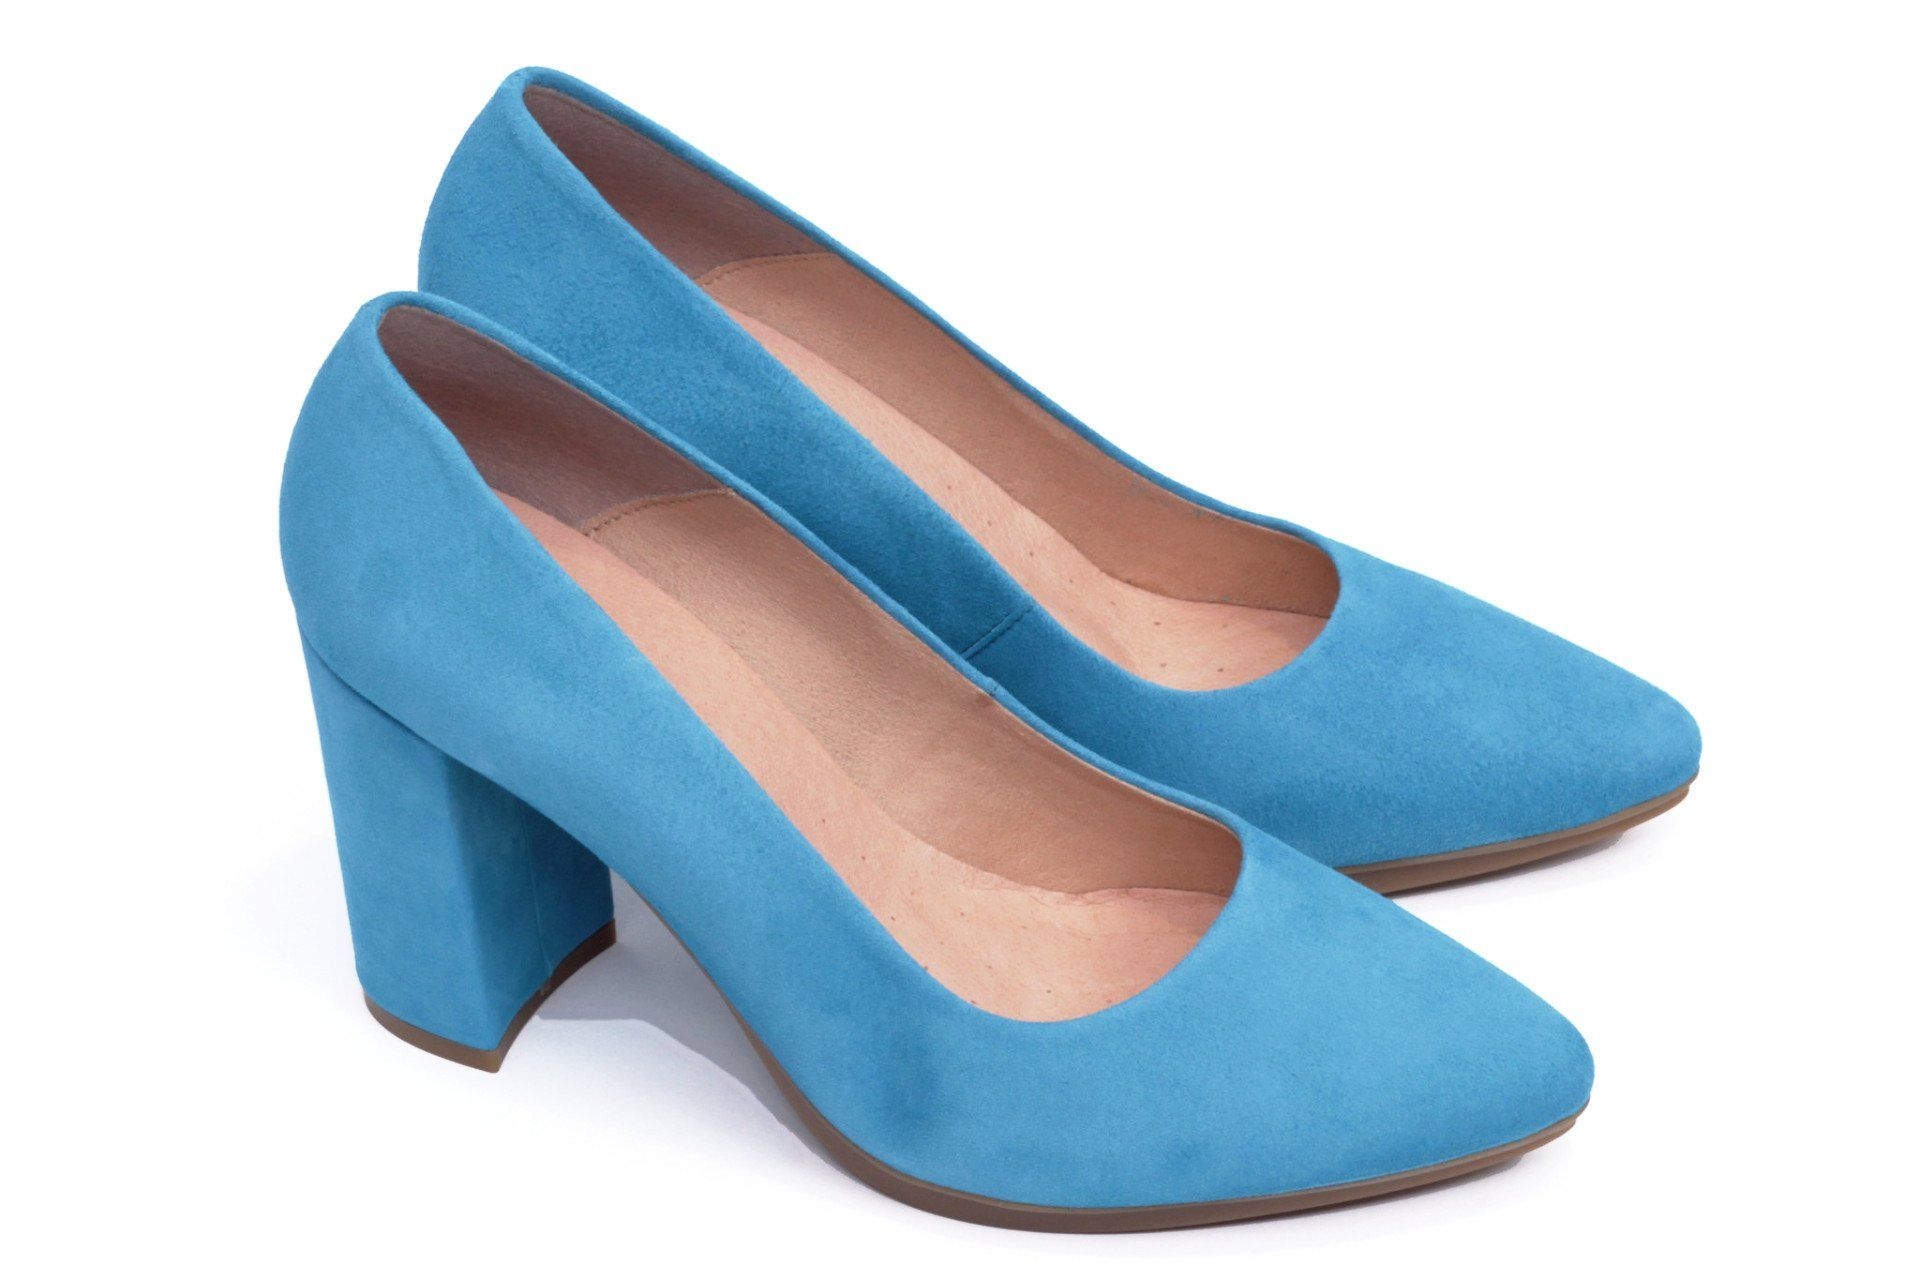 263b507d miMaO Urban Azul Pitufo - Zapato mujer de tacon salones azul vestir cómodo  - women high